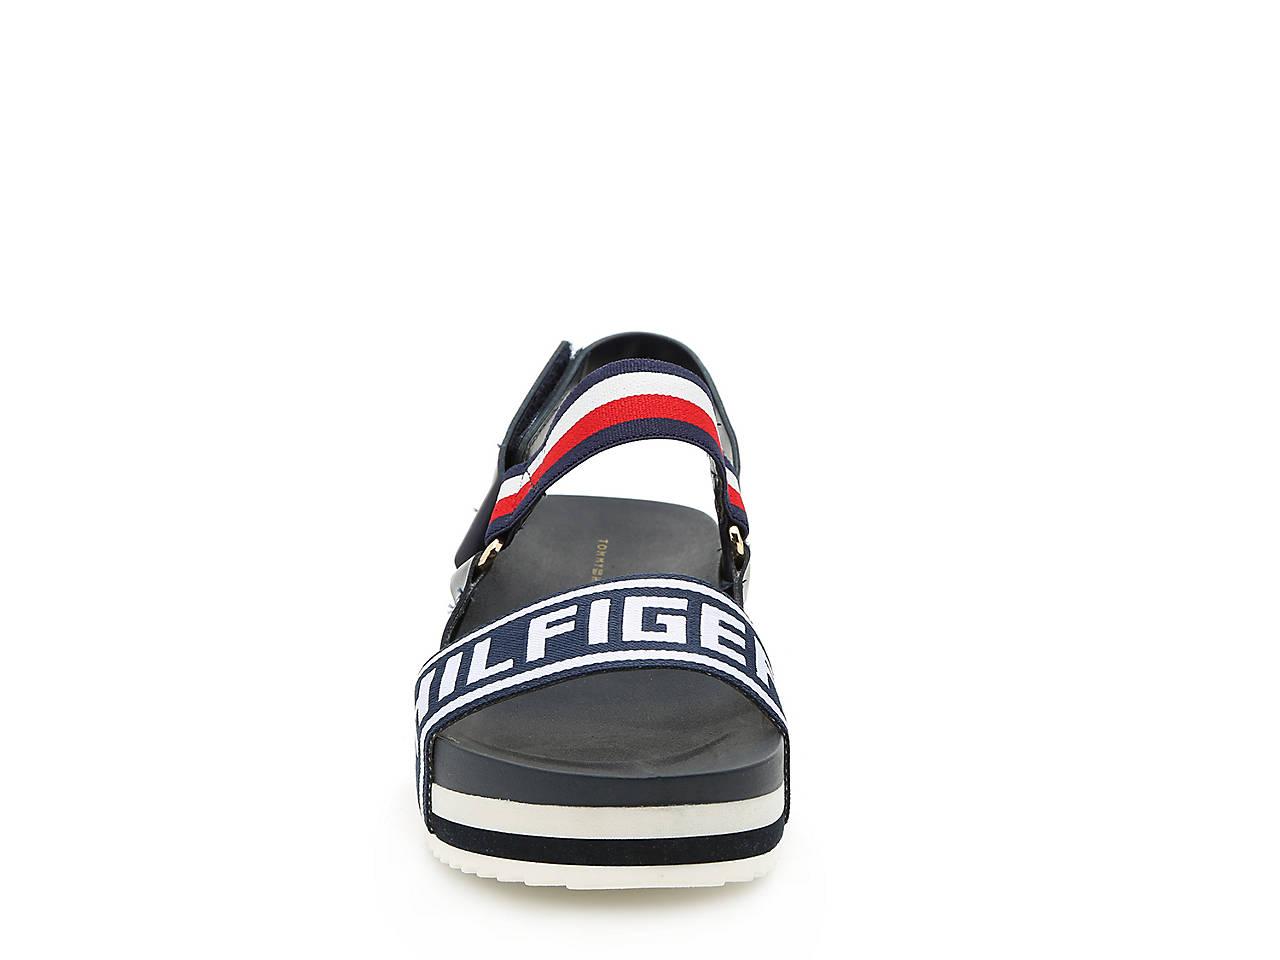 9ecfa3f70 Tommy Hilfiger Bekett Platform Sandal Women s Shoes